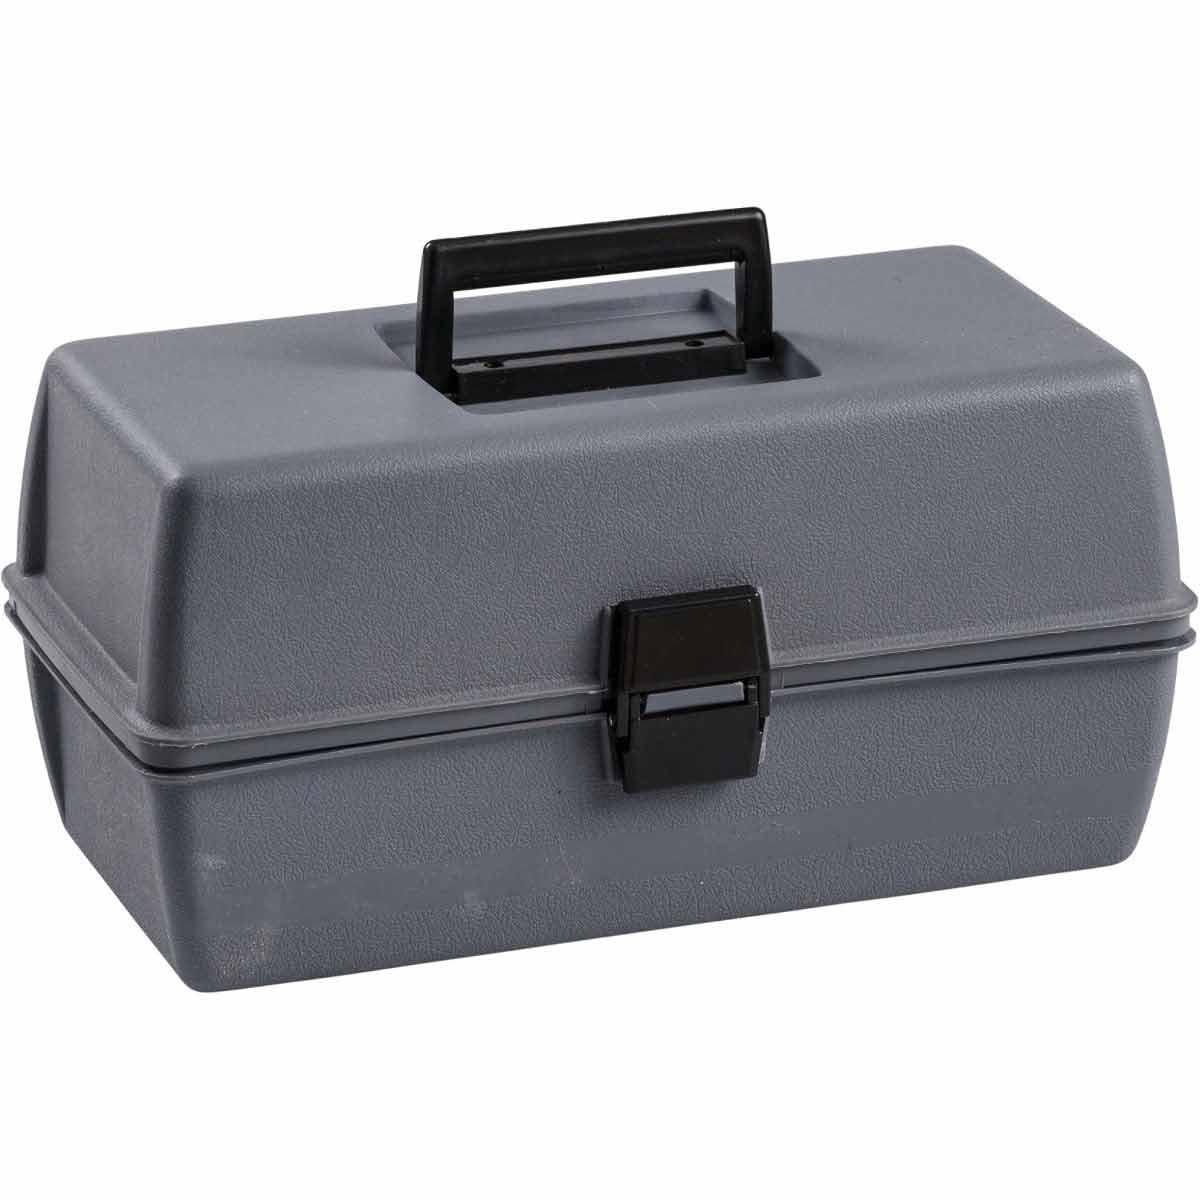 Brady Part: LKP-TKLBOX | 45613 | Extra-large rugged plastic tool box ...